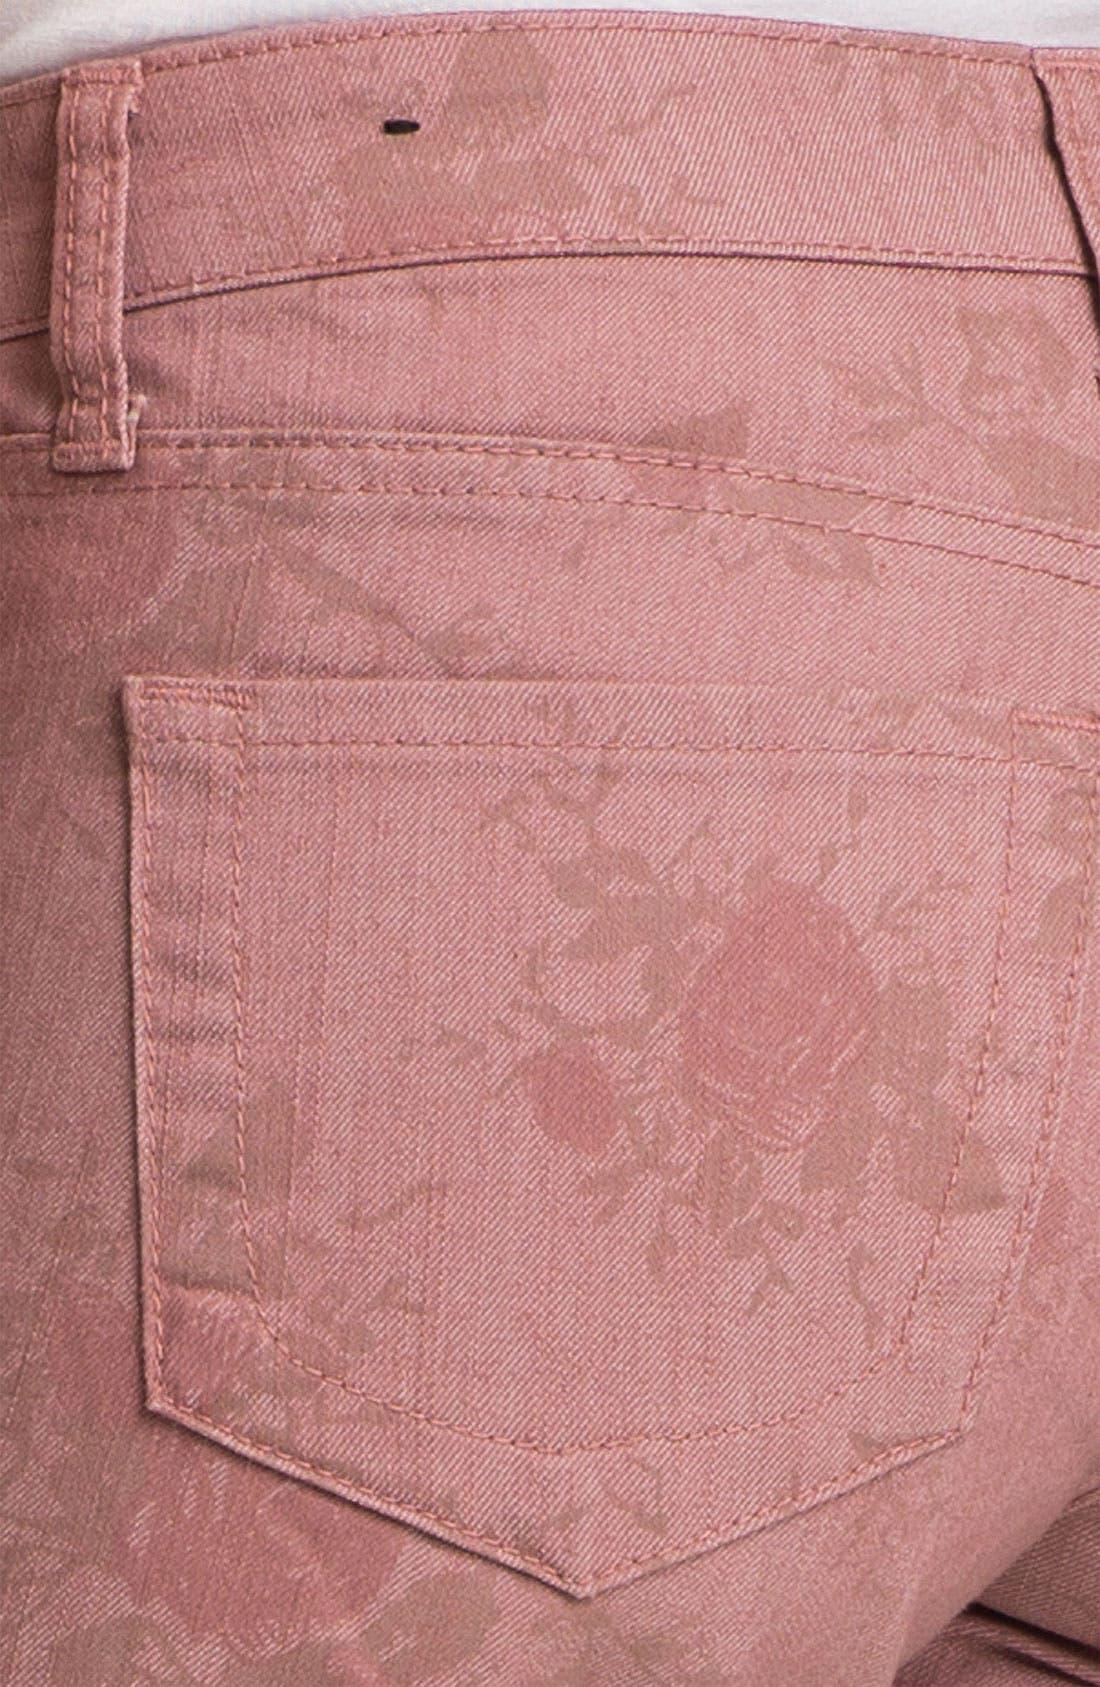 'Diana' Print Skinny Jeans,                             Alternate thumbnail 2, color,